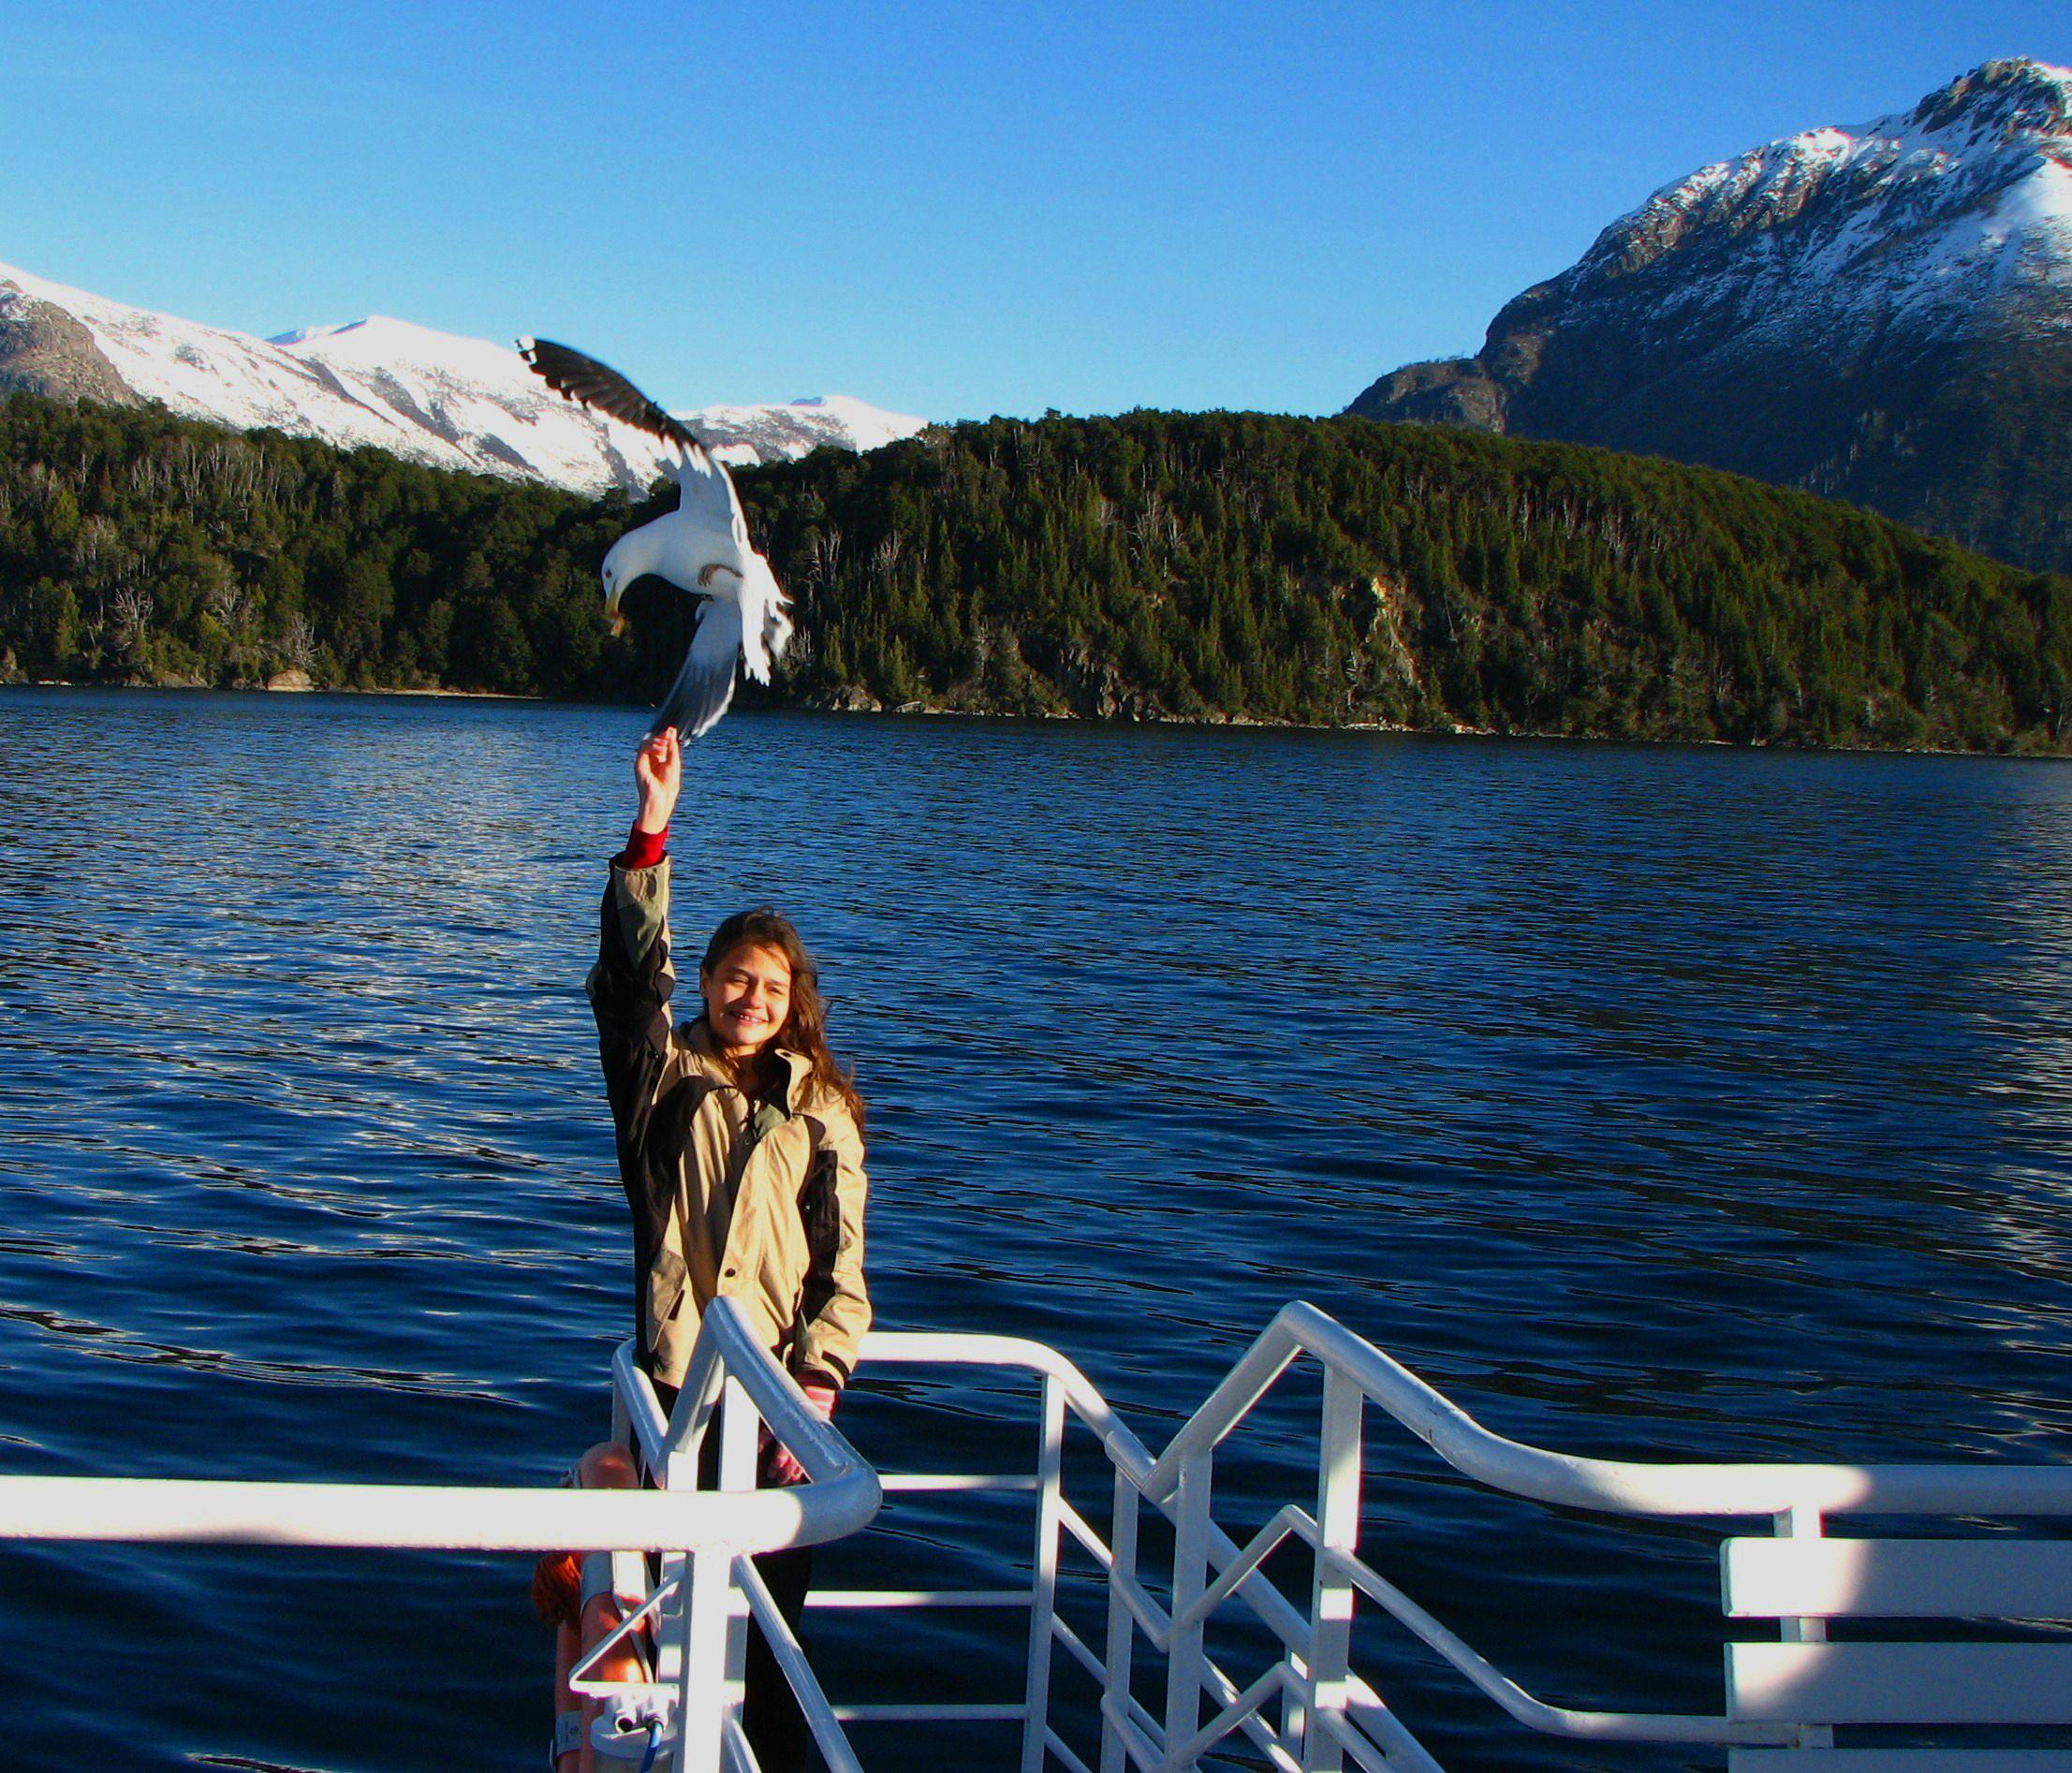 Roundtrip Andean Crossing to Bariloche